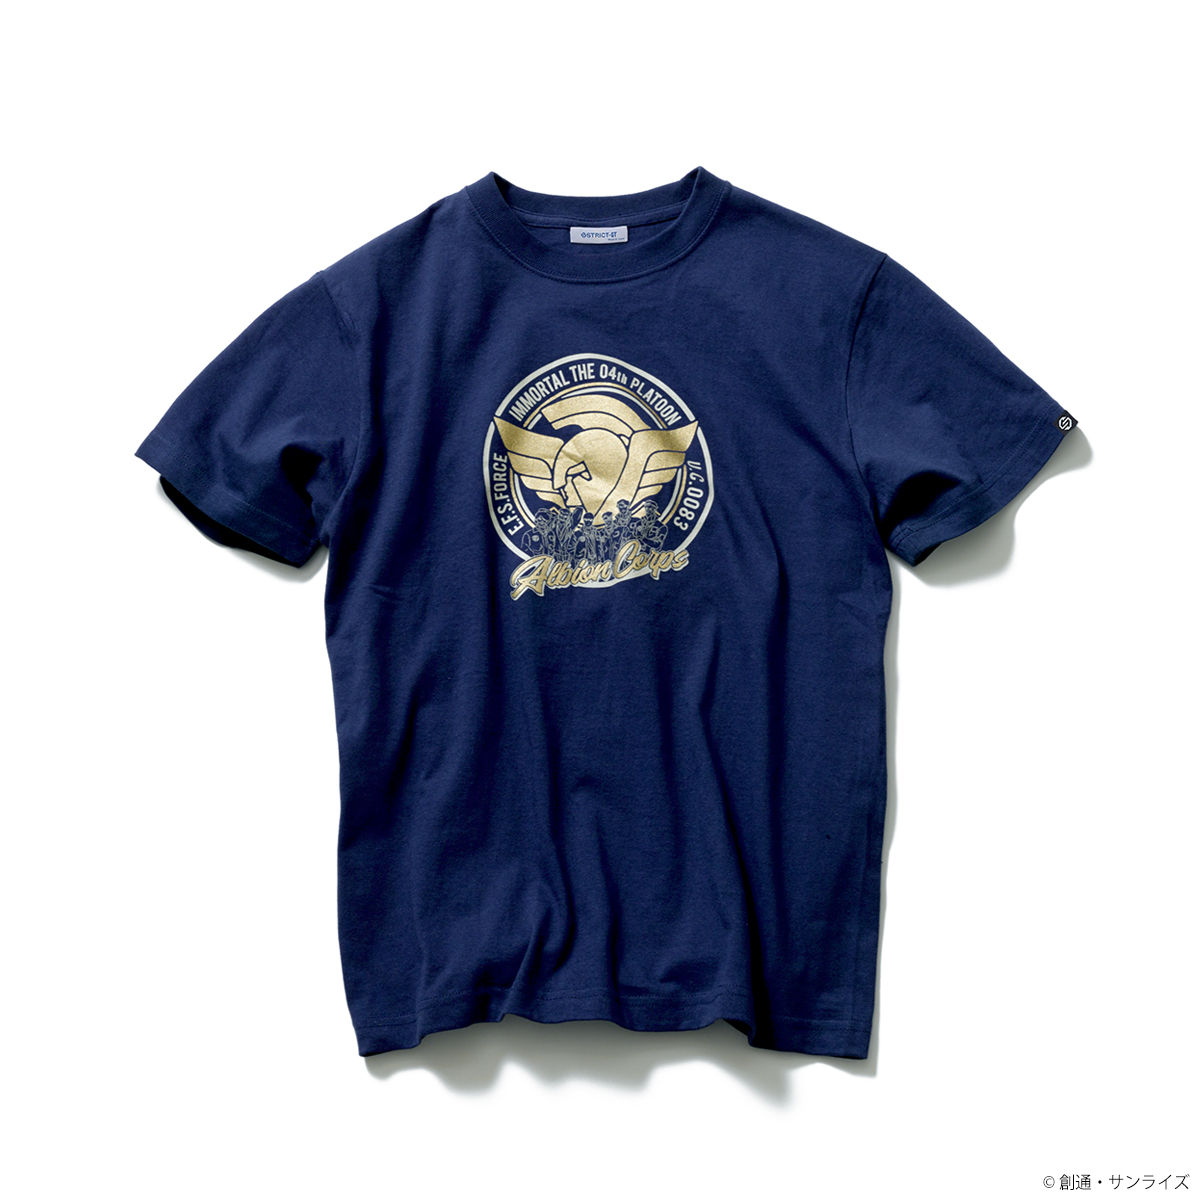 Albion Corps T-shirt—Mobile Suit Gundam 0083: Stardust Memory